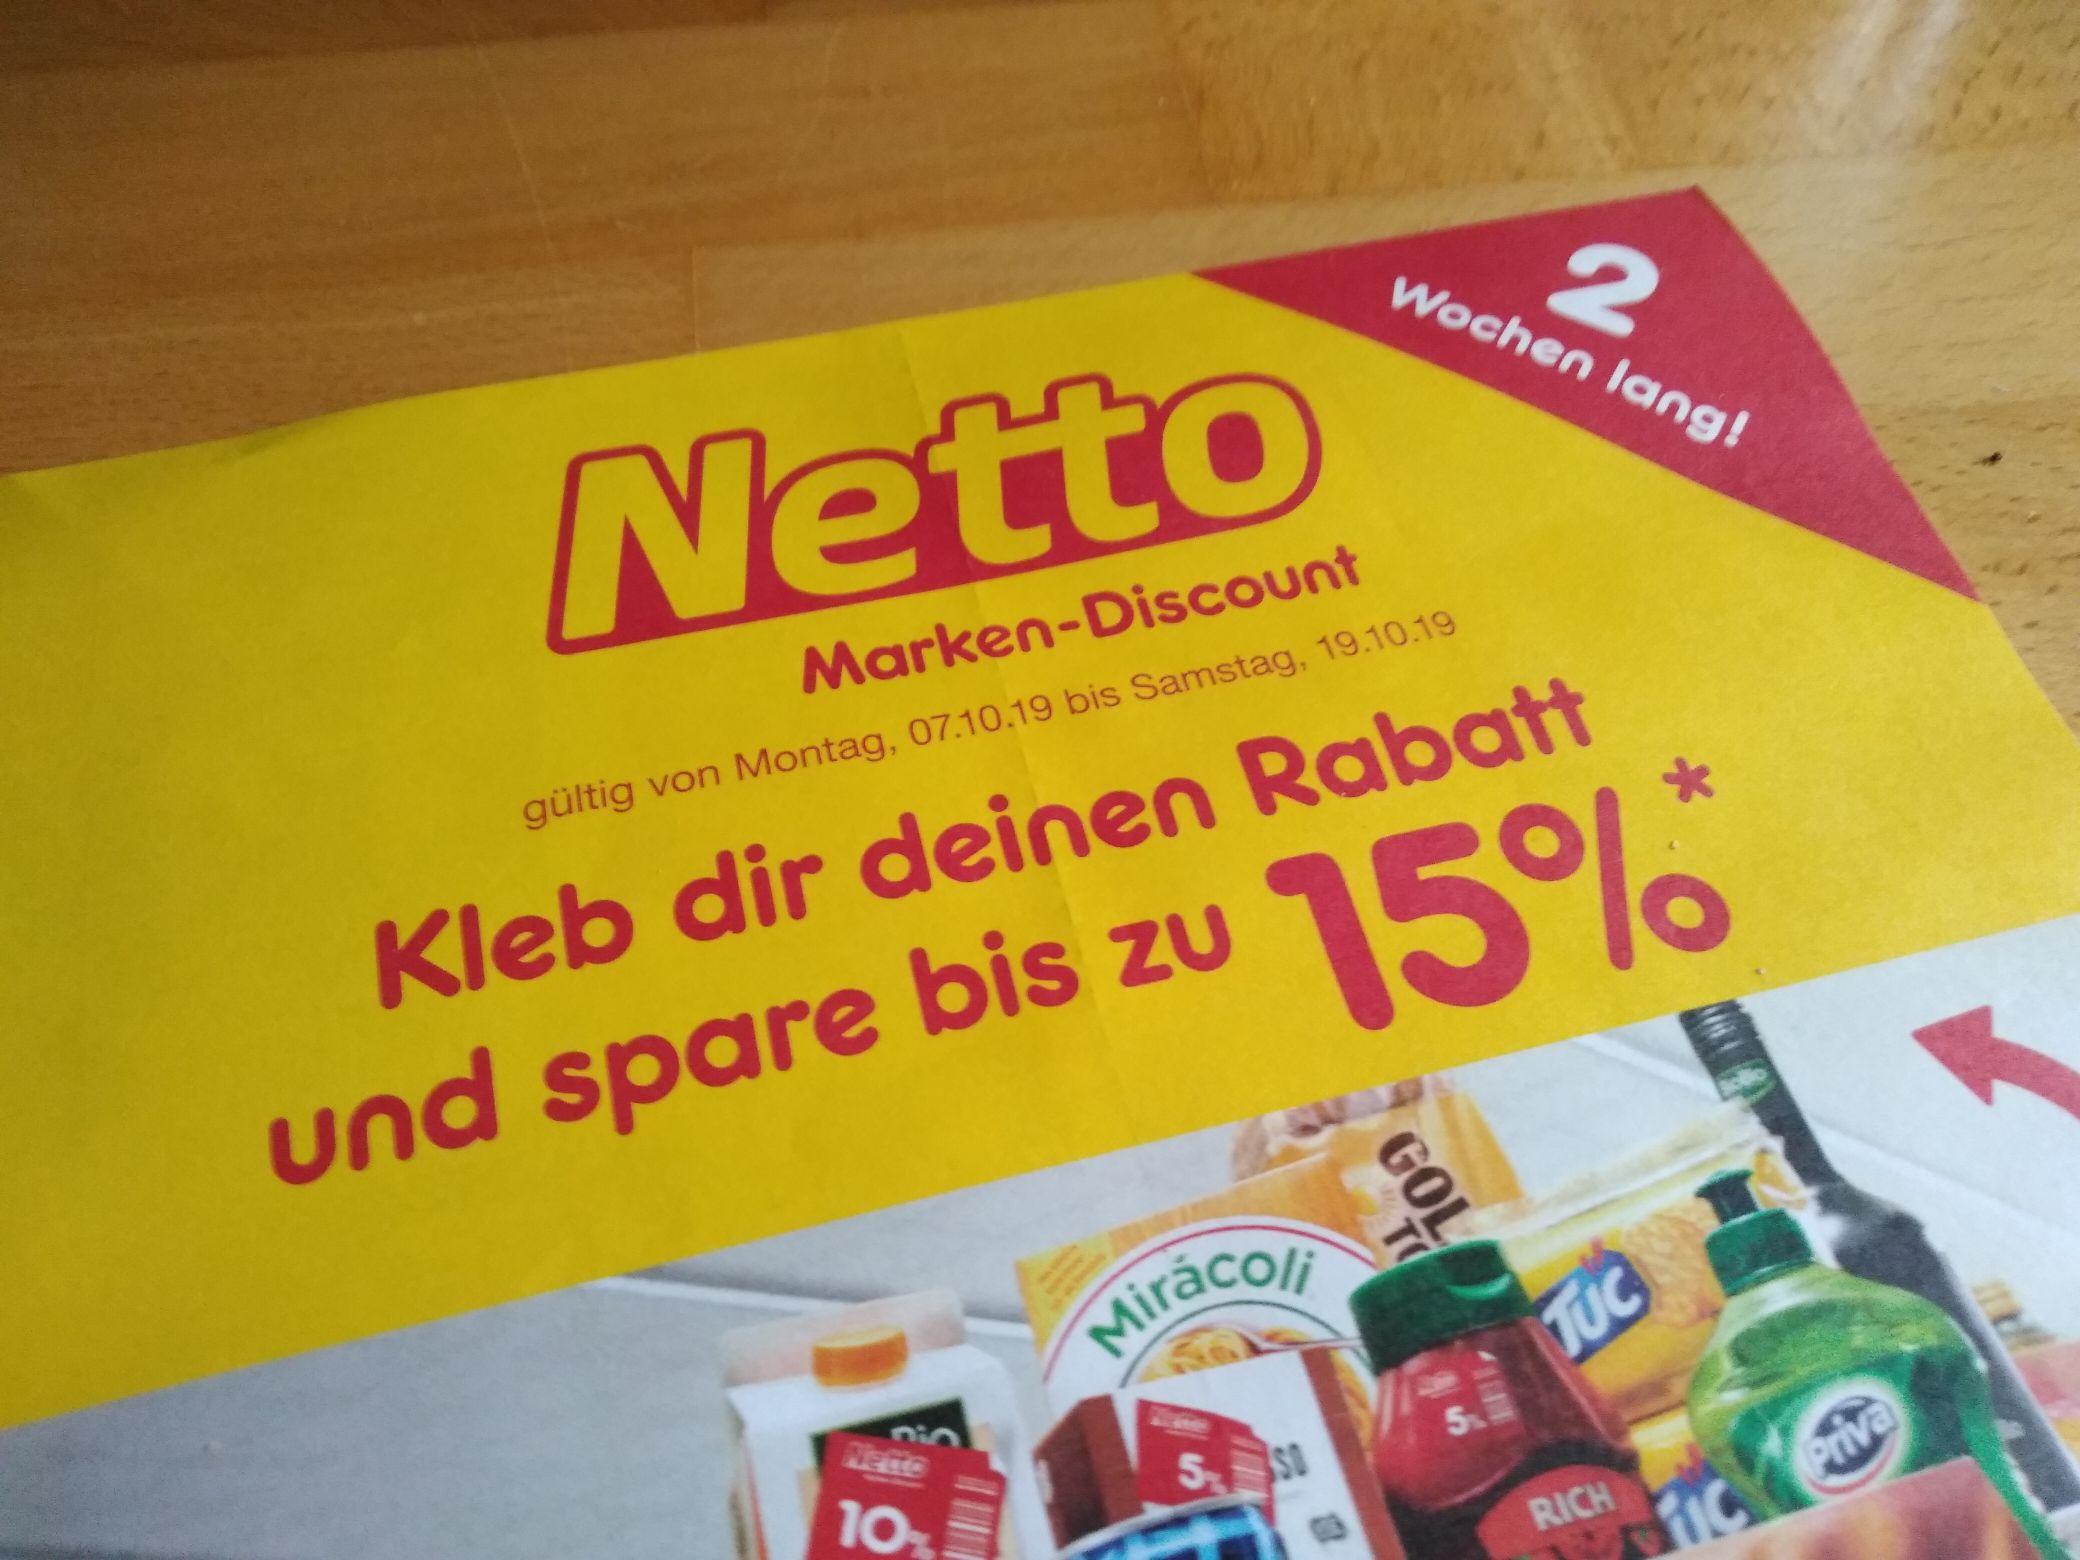 Netto Marken-Discount / Lokal: Köln / 07.10.2019 - 19.10.2019